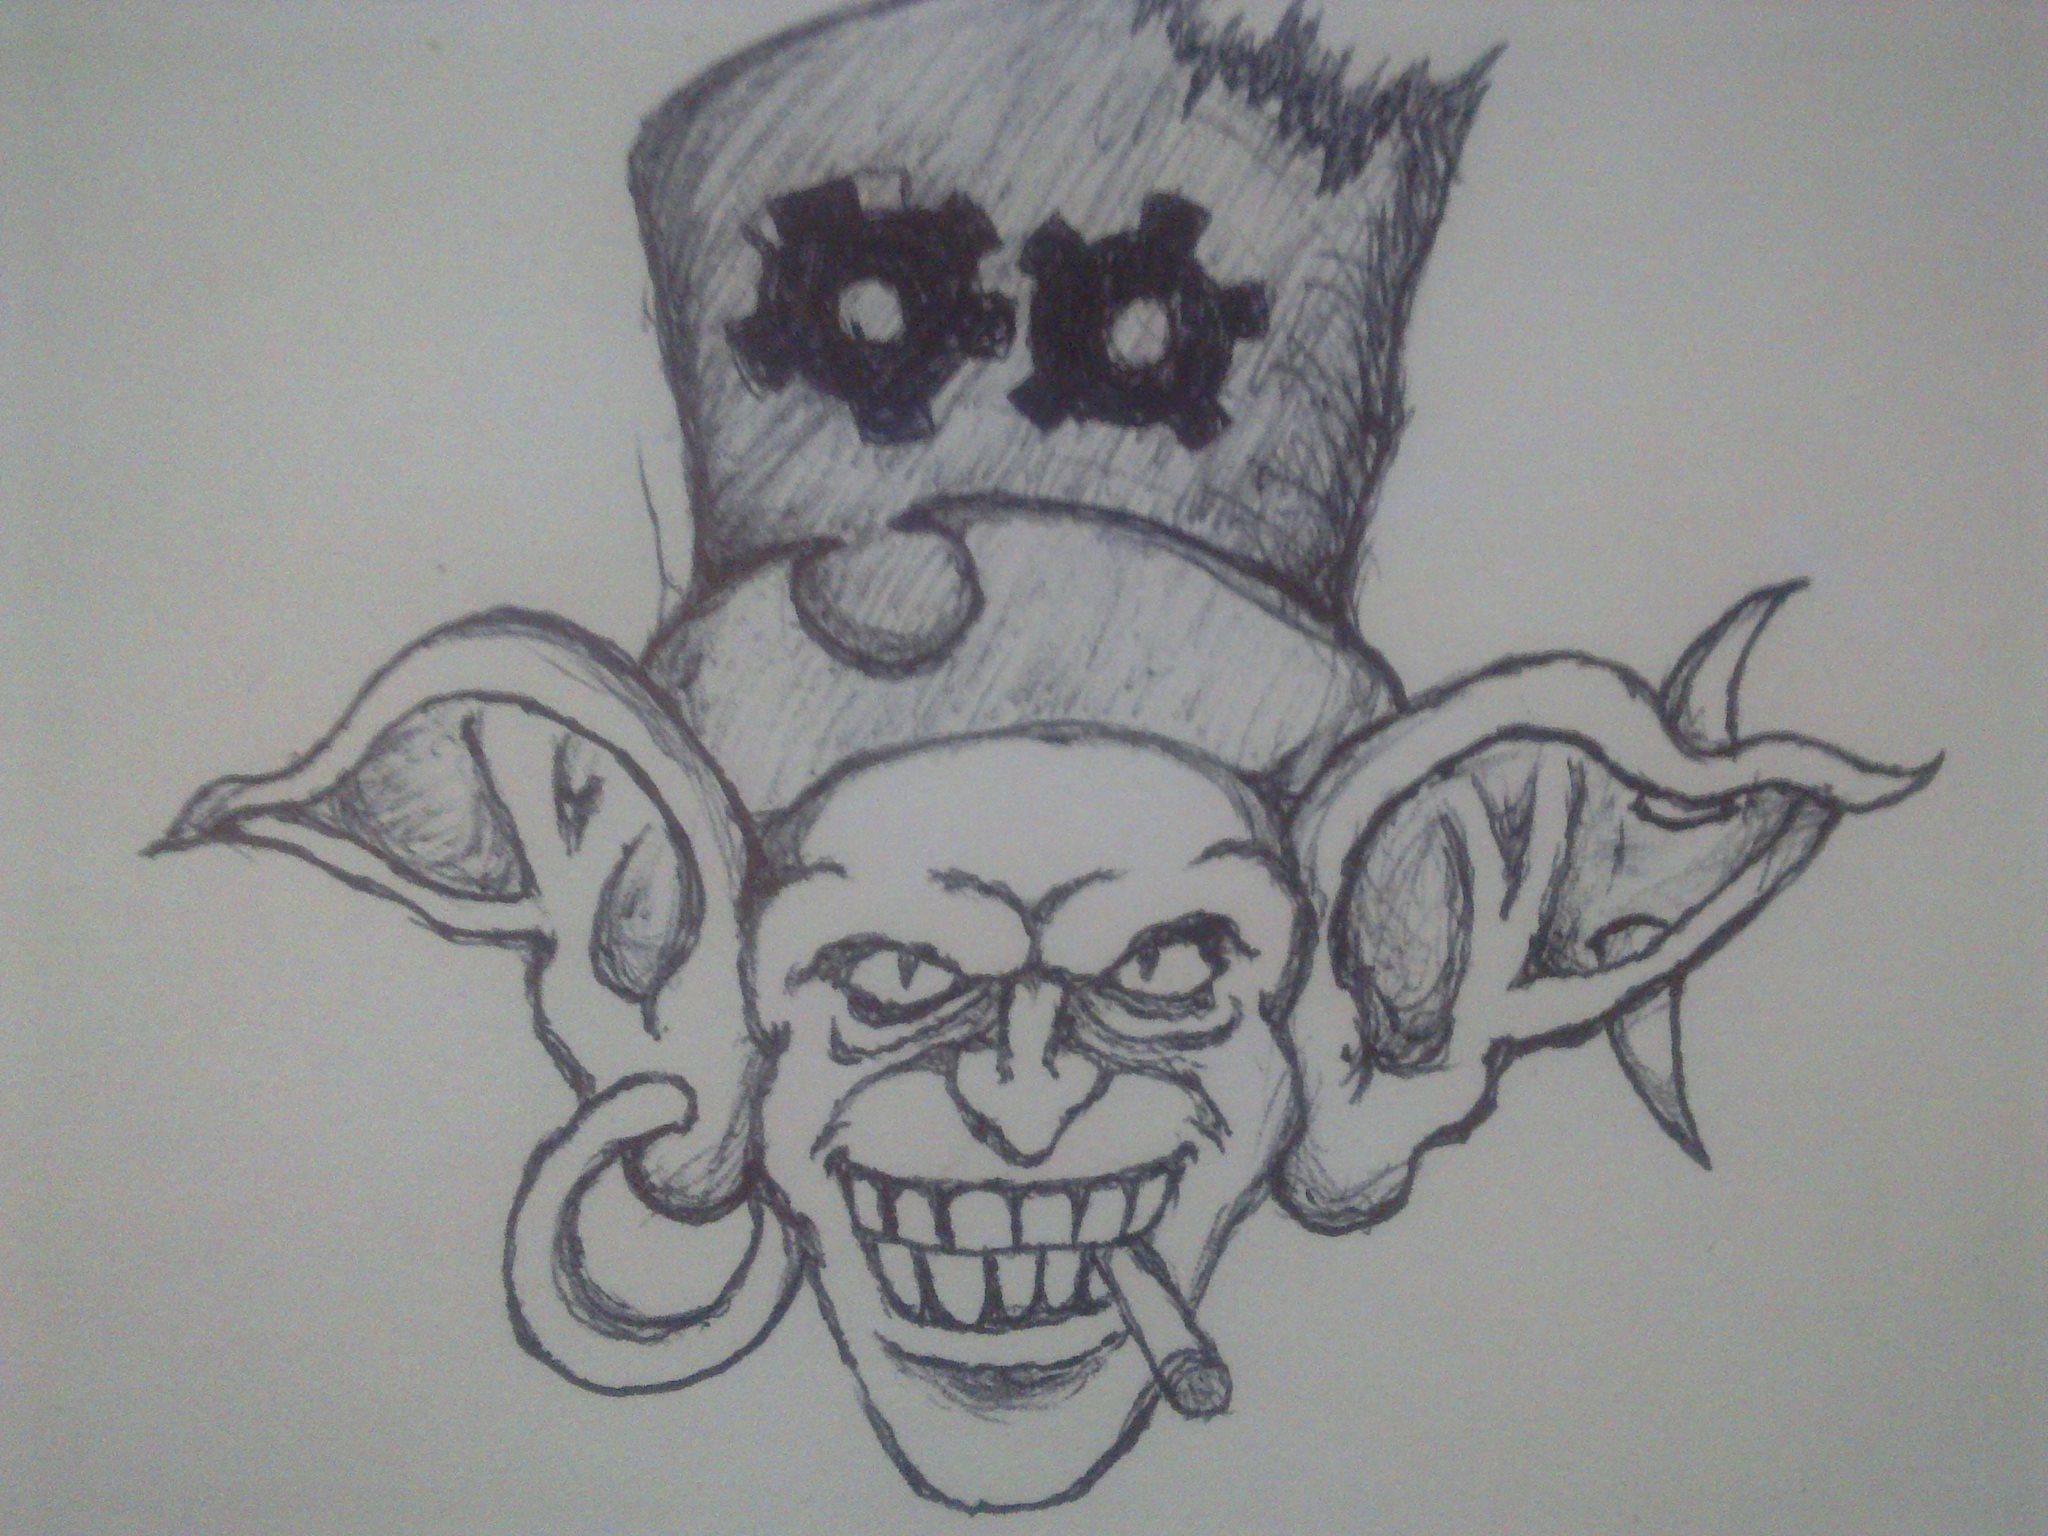 World of Warcraft's goblin doodle